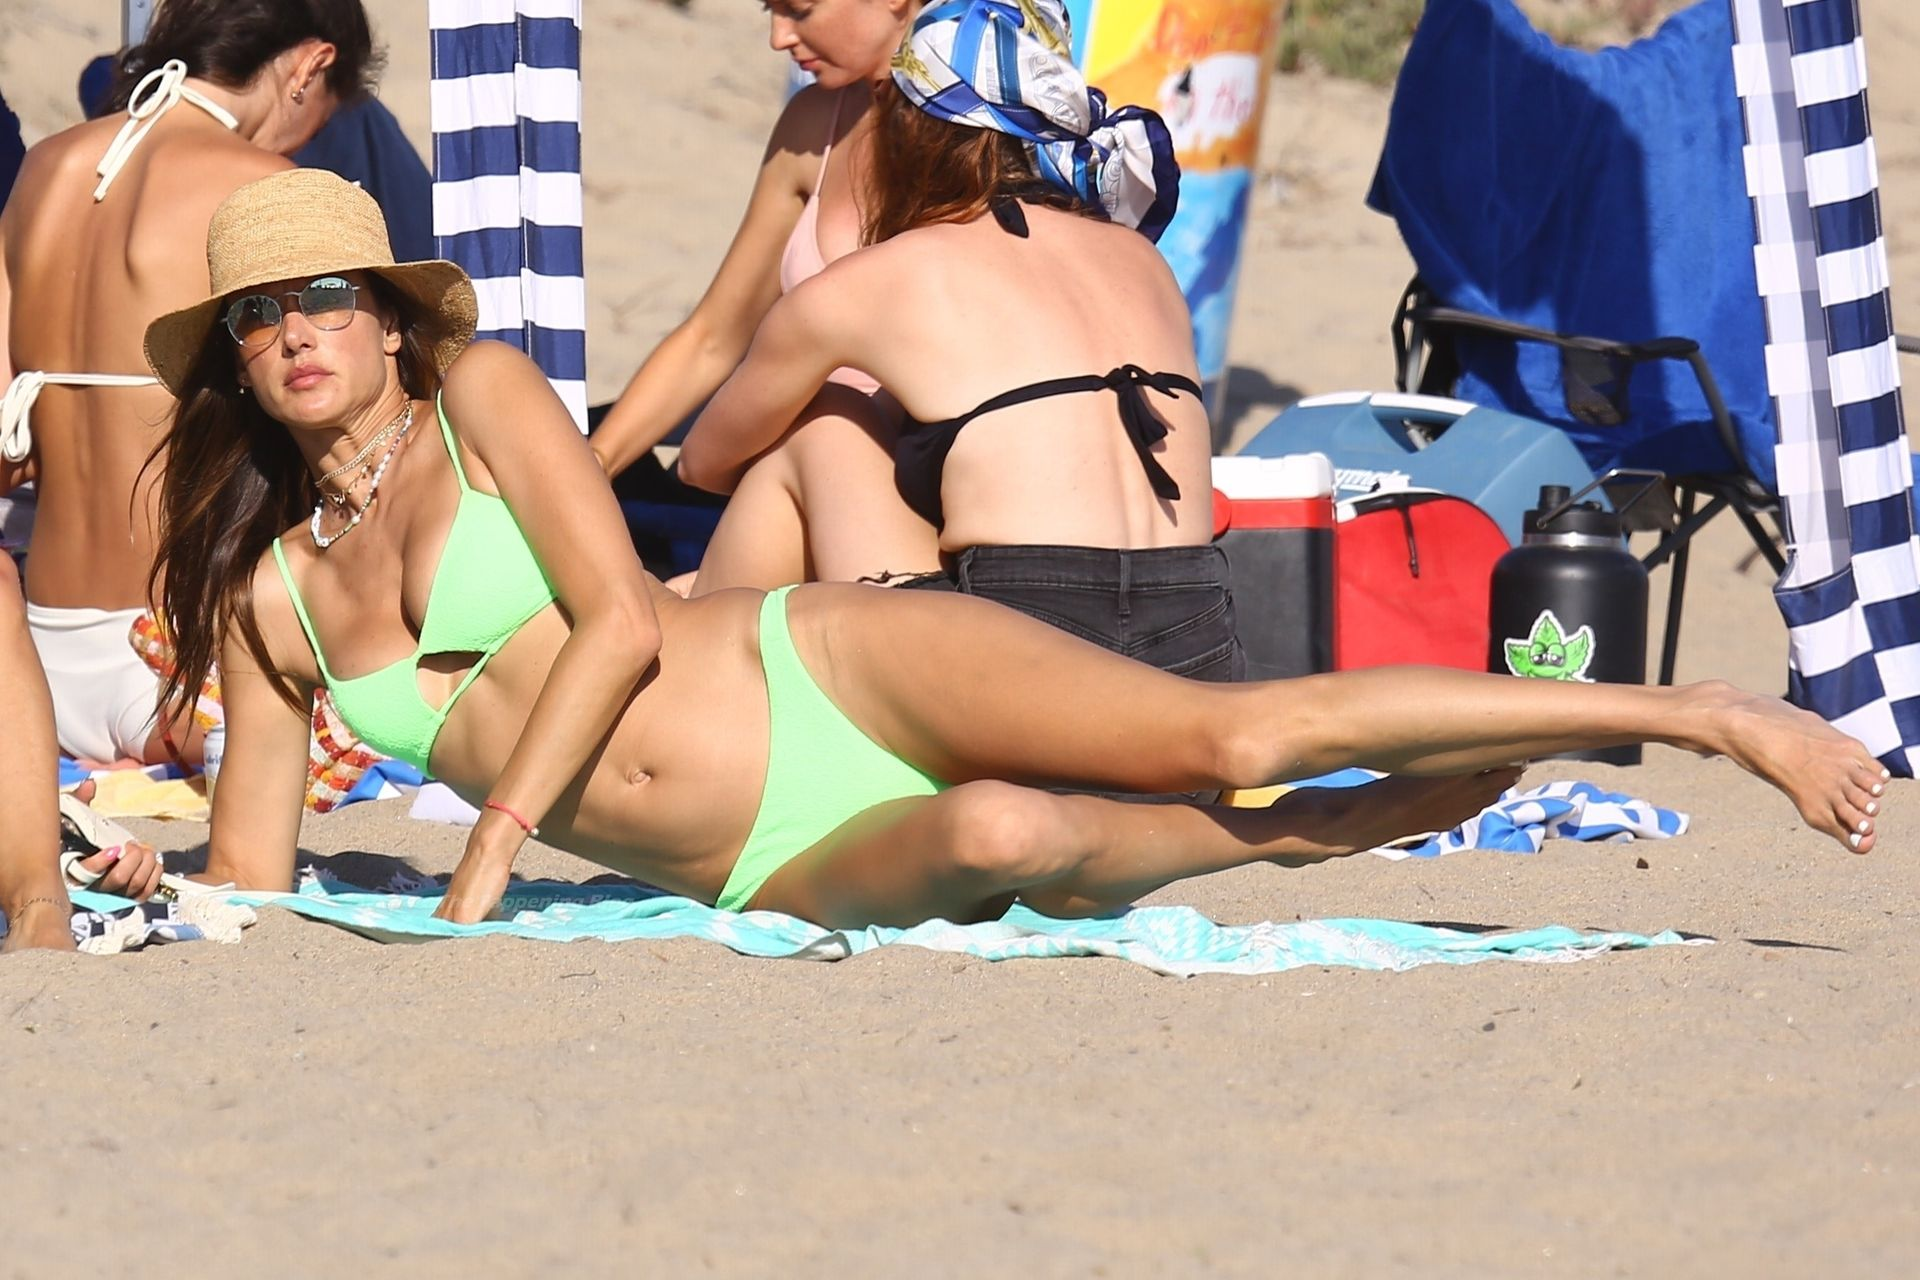 Alessandra-Ambrosio-Sexy-The-Fappening-Blog-951.jpg